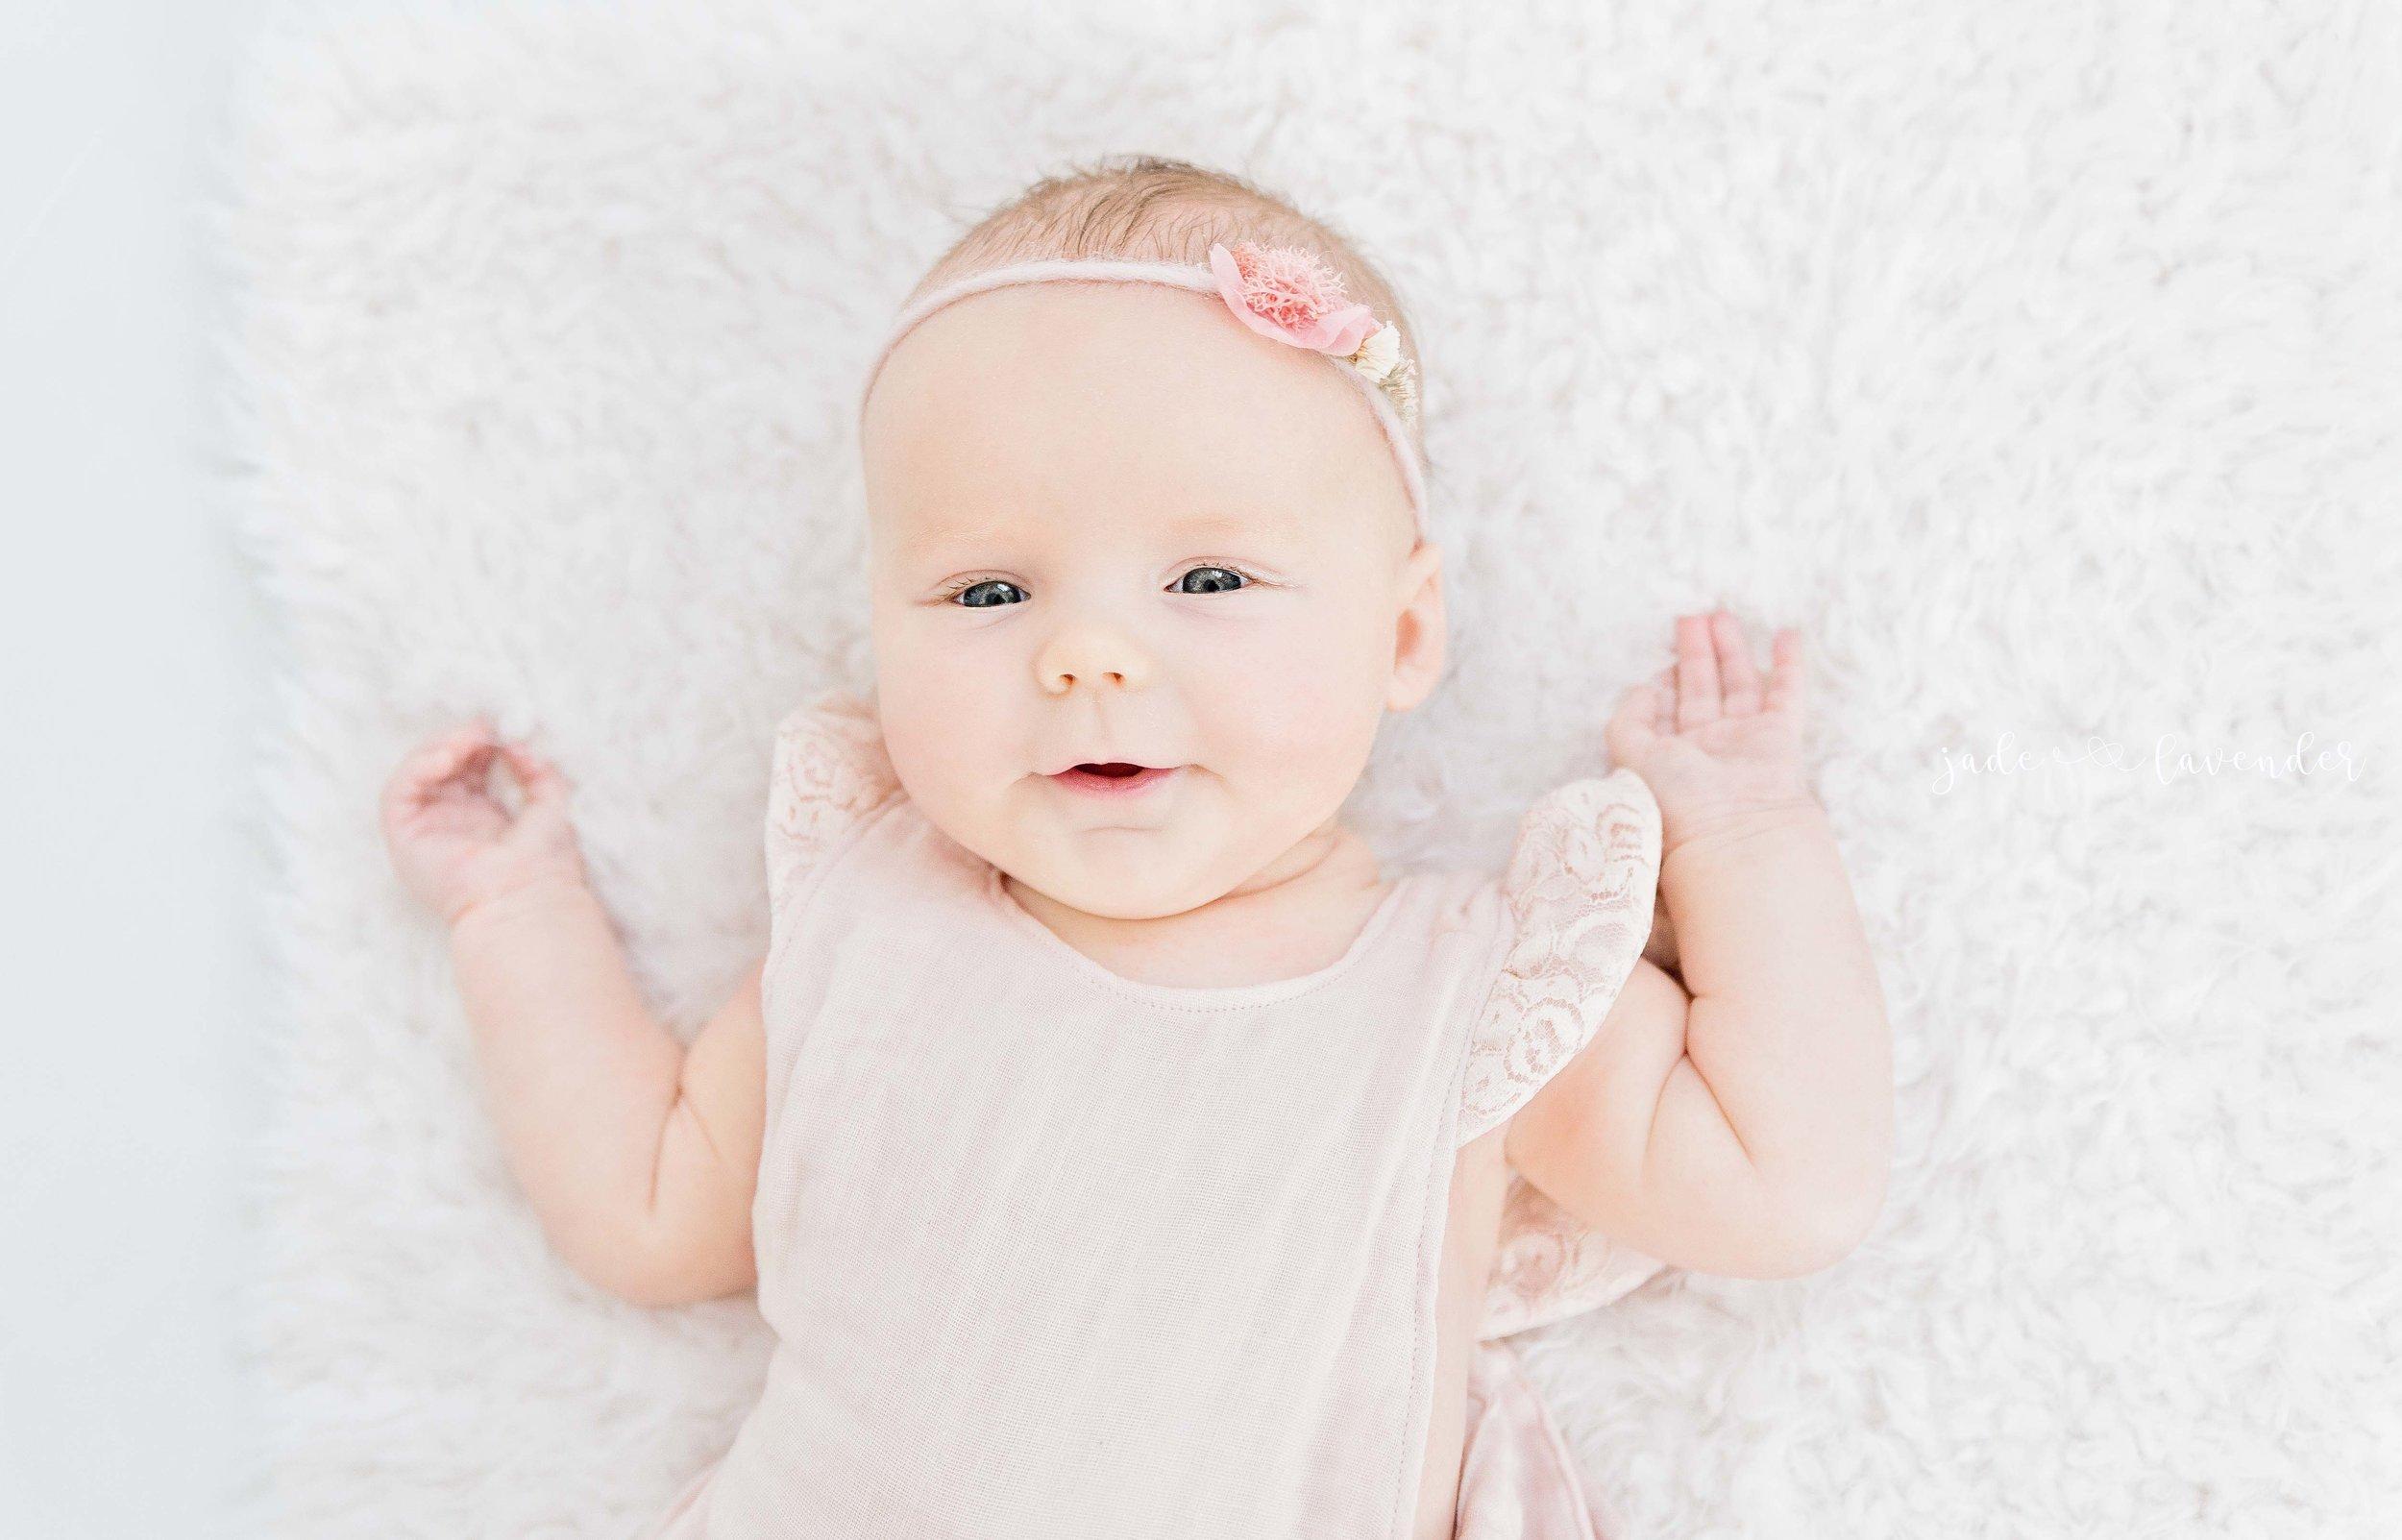 tummy-time-milestone-images-baby-photos-newborn-photography-pink-girl-spokane-washington.jpg